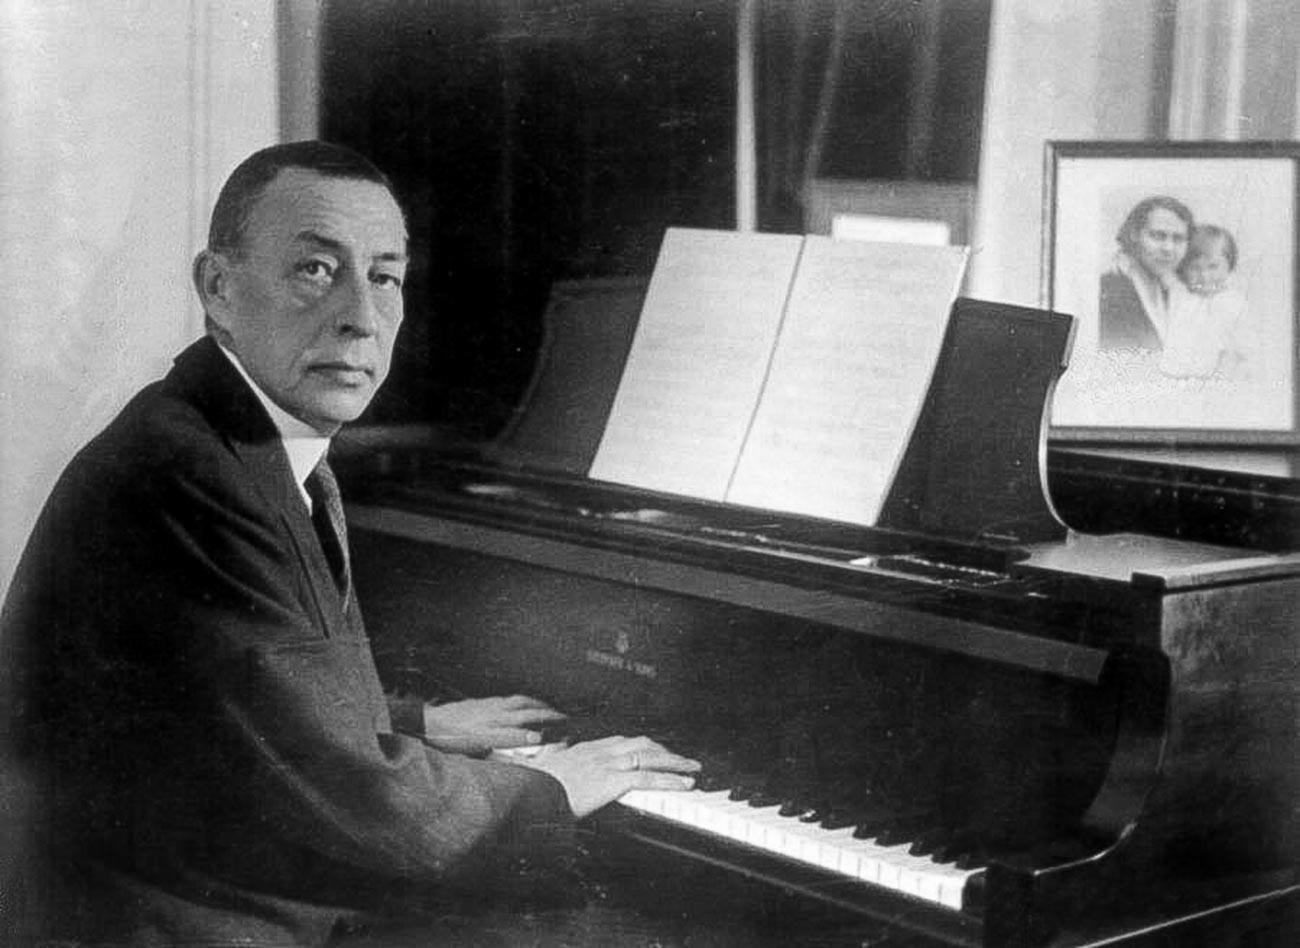 Sergei Rachmaninoff at a Steinway grand piano.